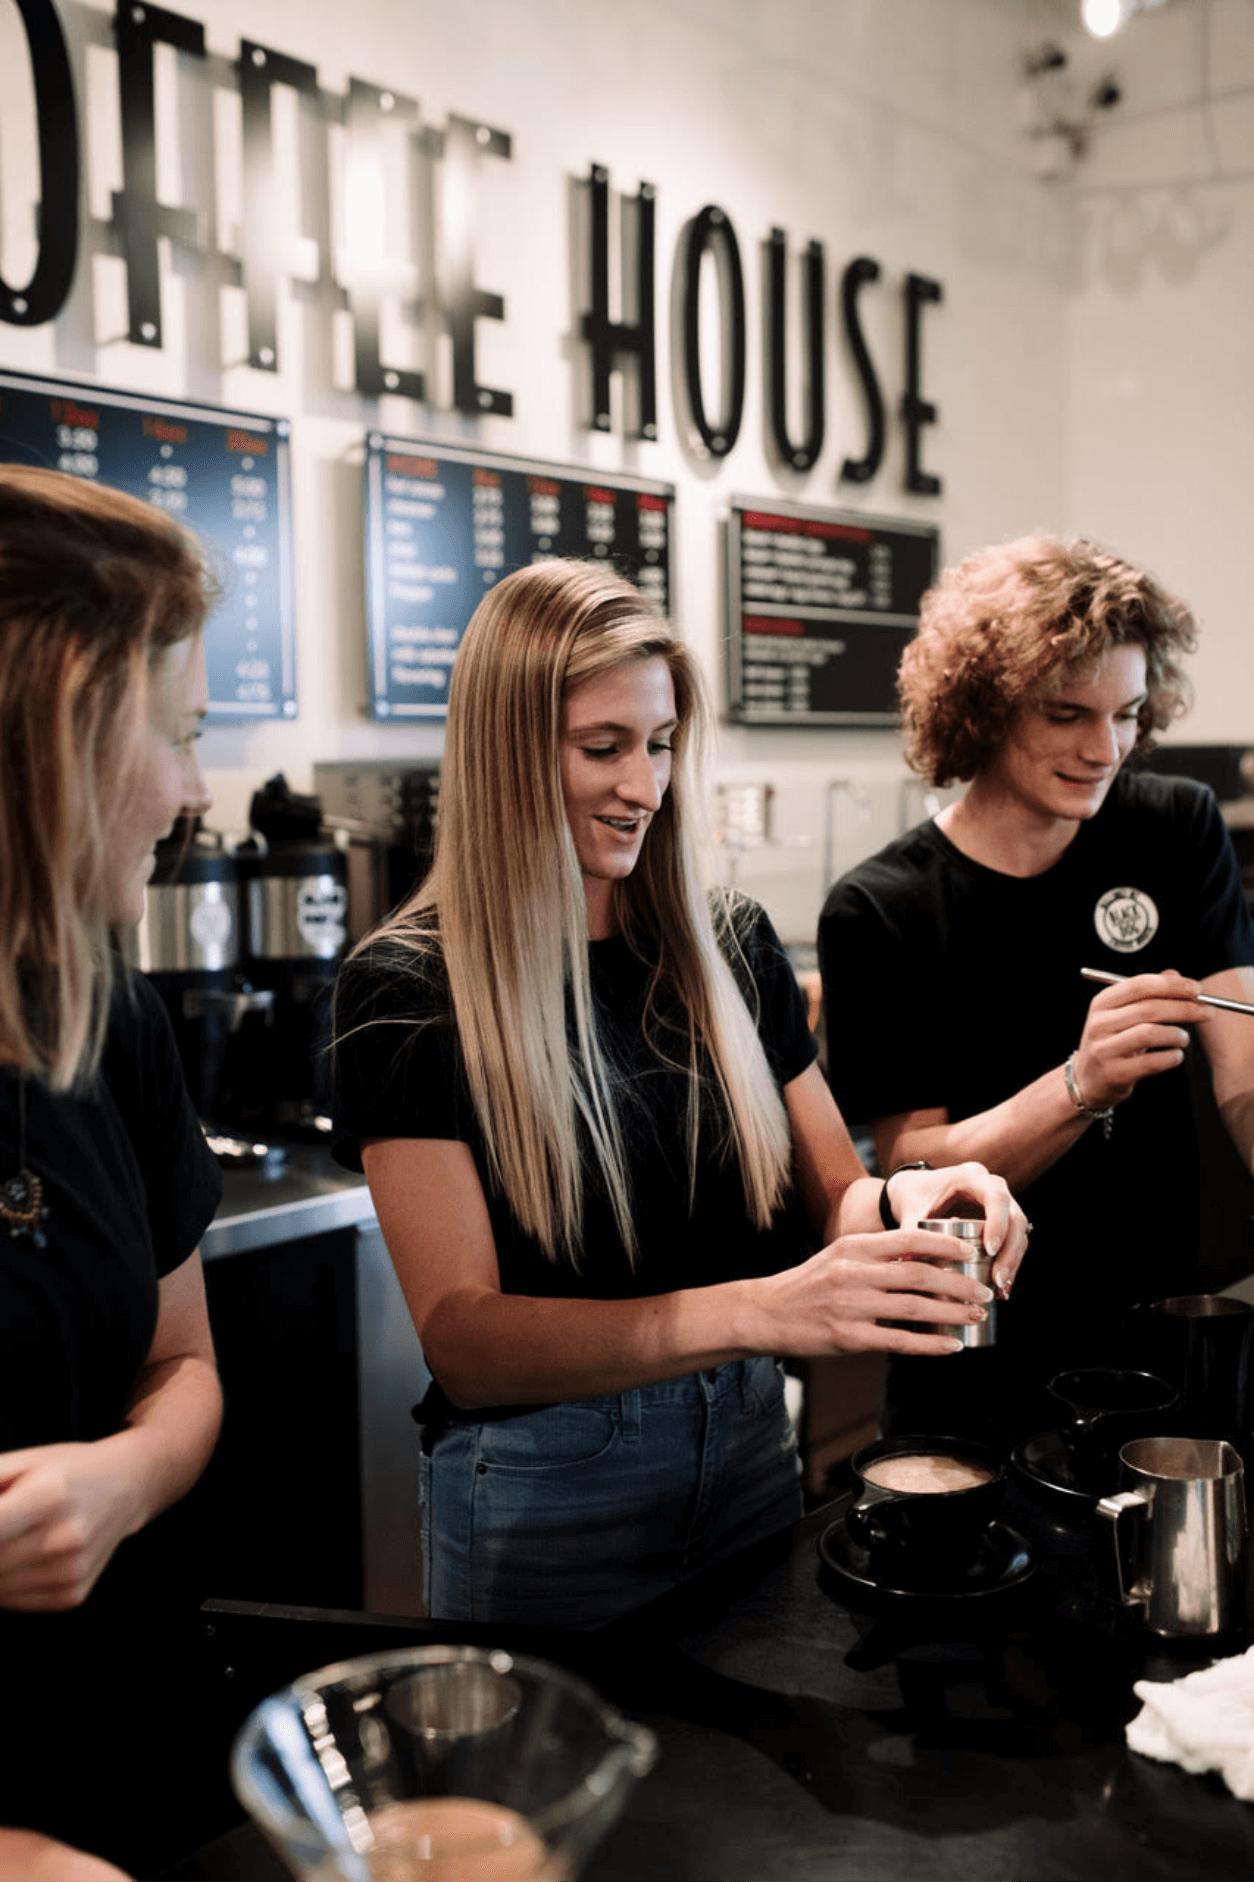 Baristas at espresso machine